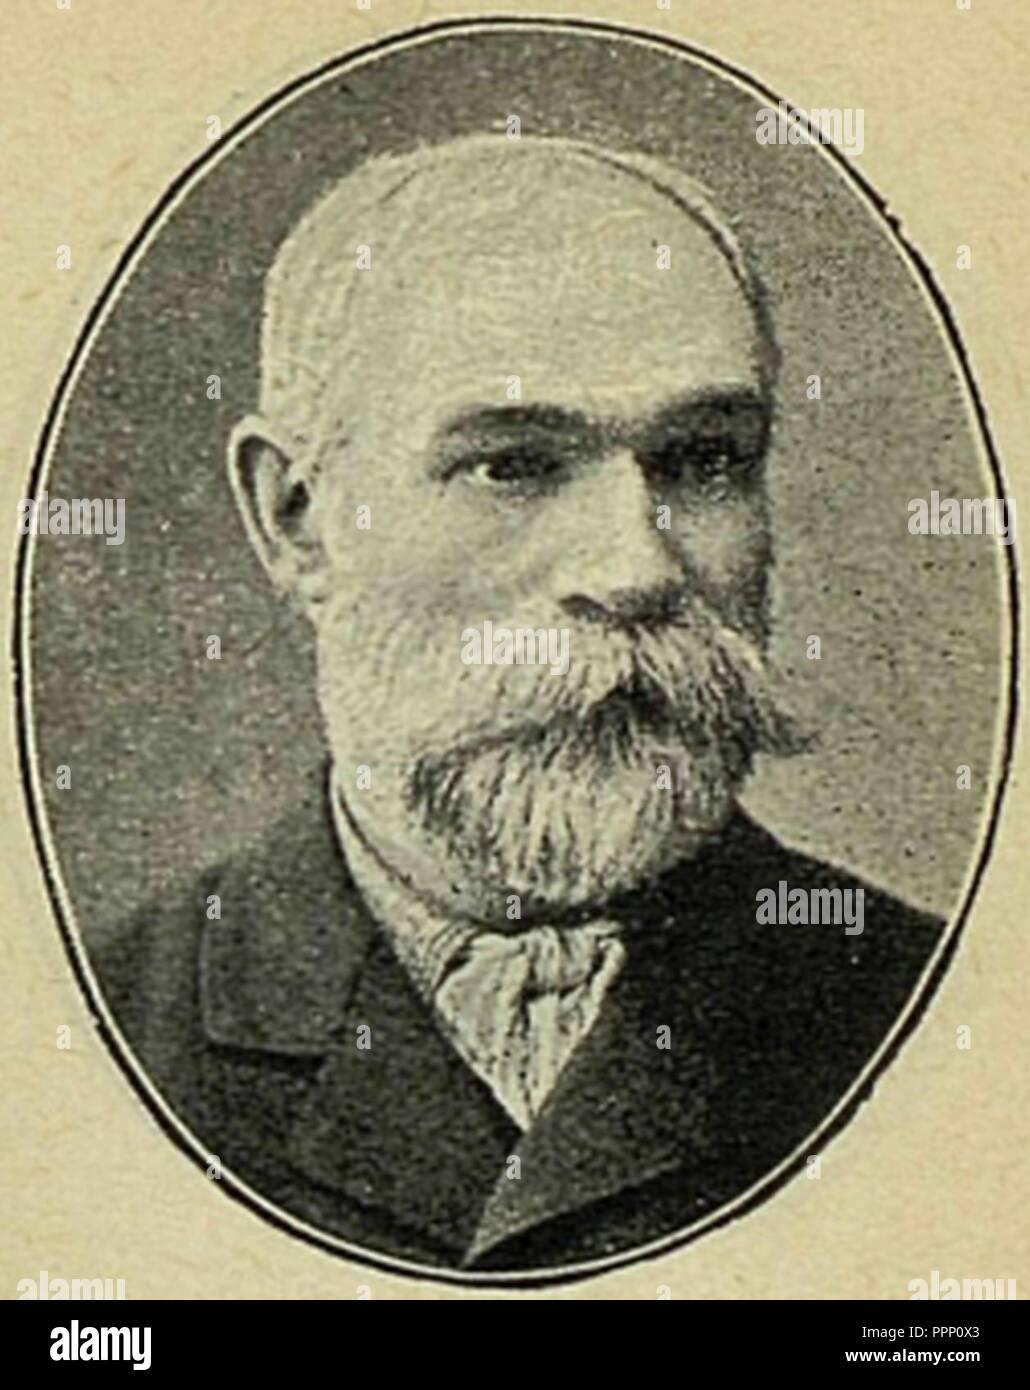 Polonsky Yakov Petrovich: biography and creativity